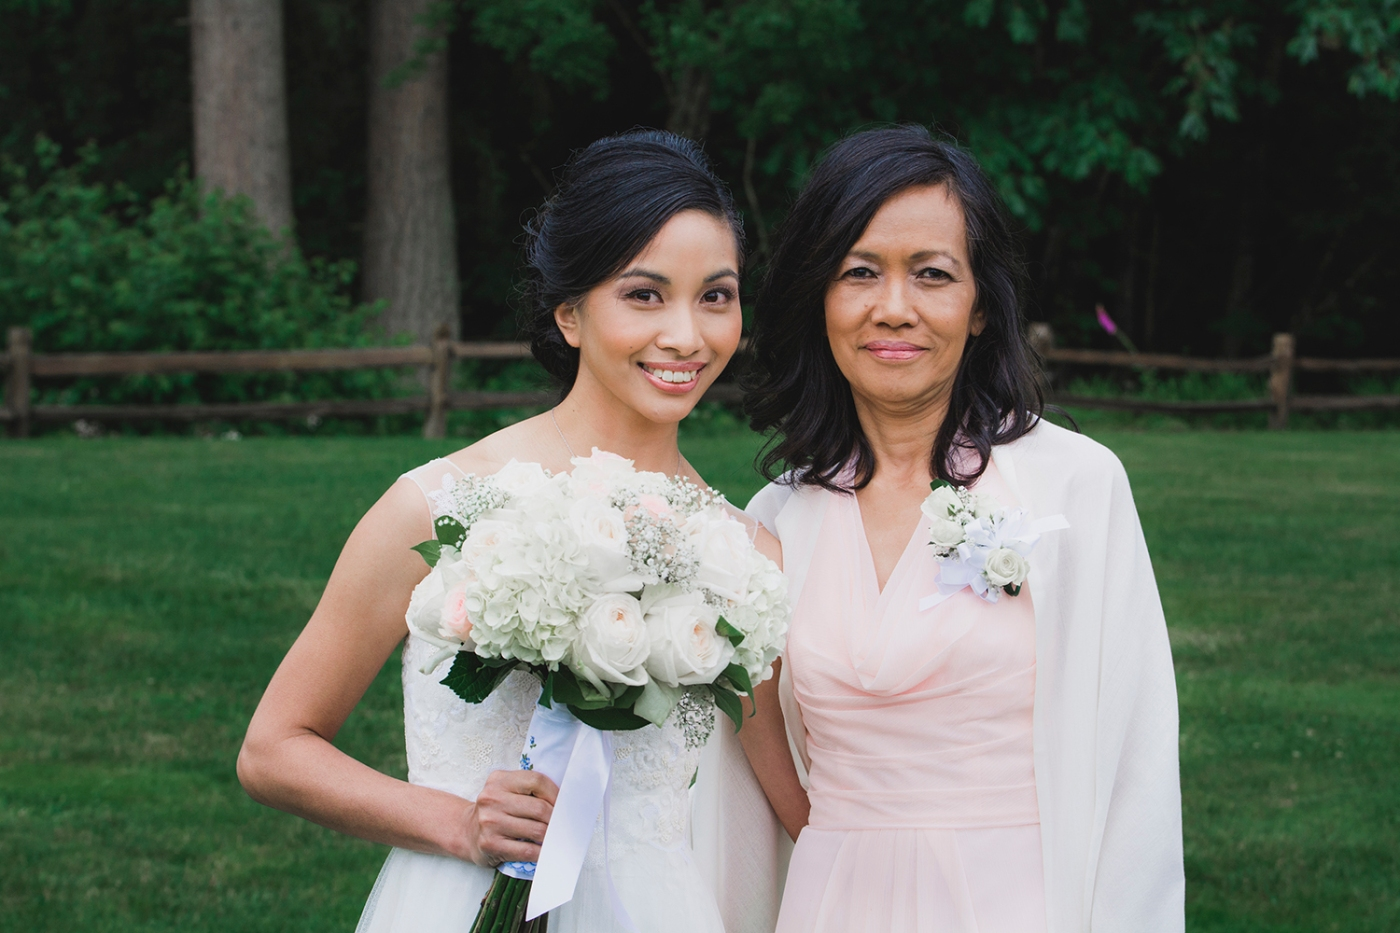 Jane_Speleers_2016_Family_Wedding_Wild_Rose_Estates_Venue_ DSC_JS7_7696